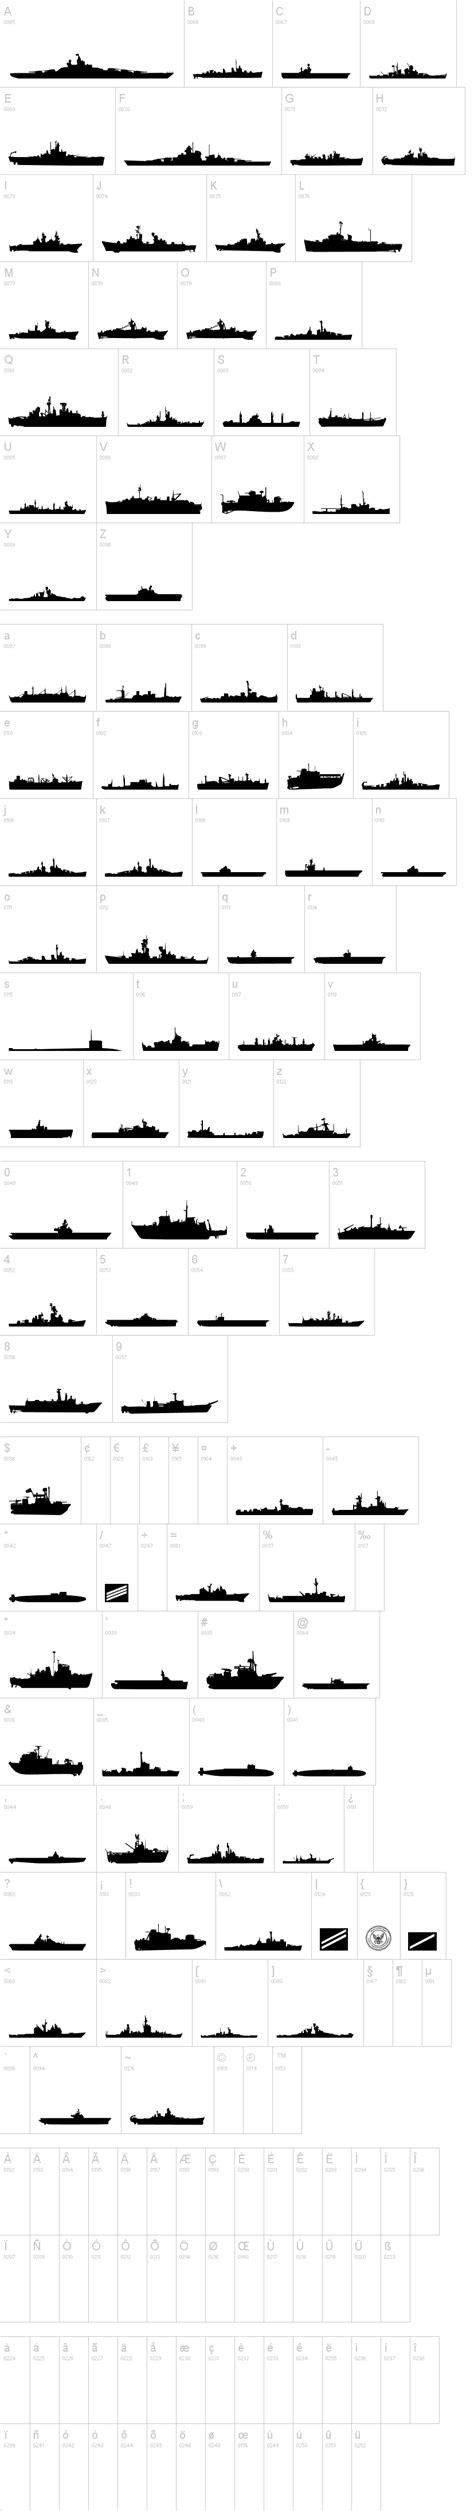 dafont military us navy font dafont com